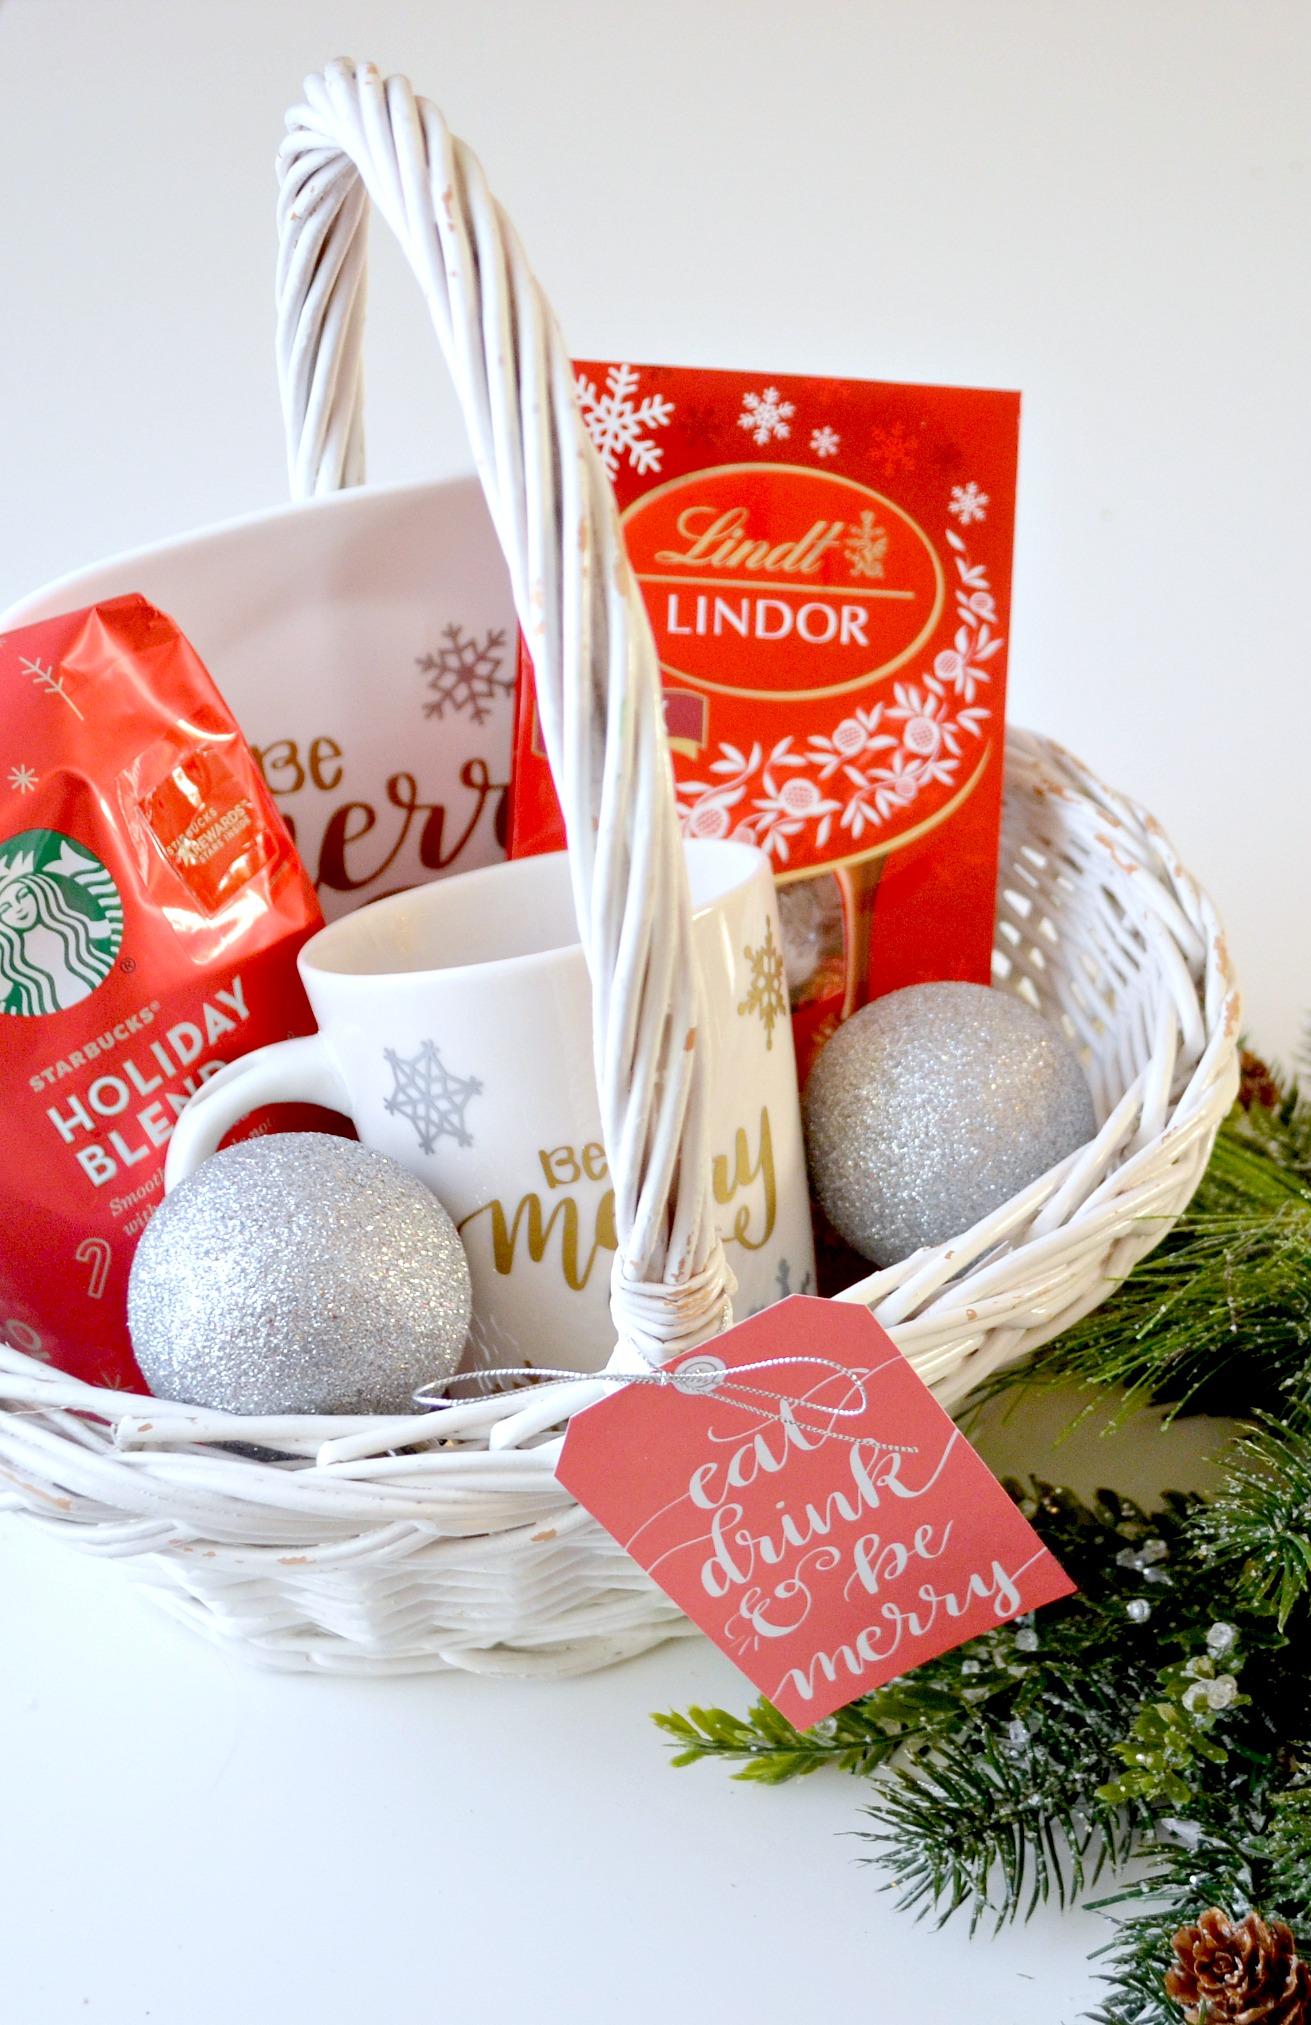 Starbucks and Lindt Coffee & Chocolate Christmas Gift Basket